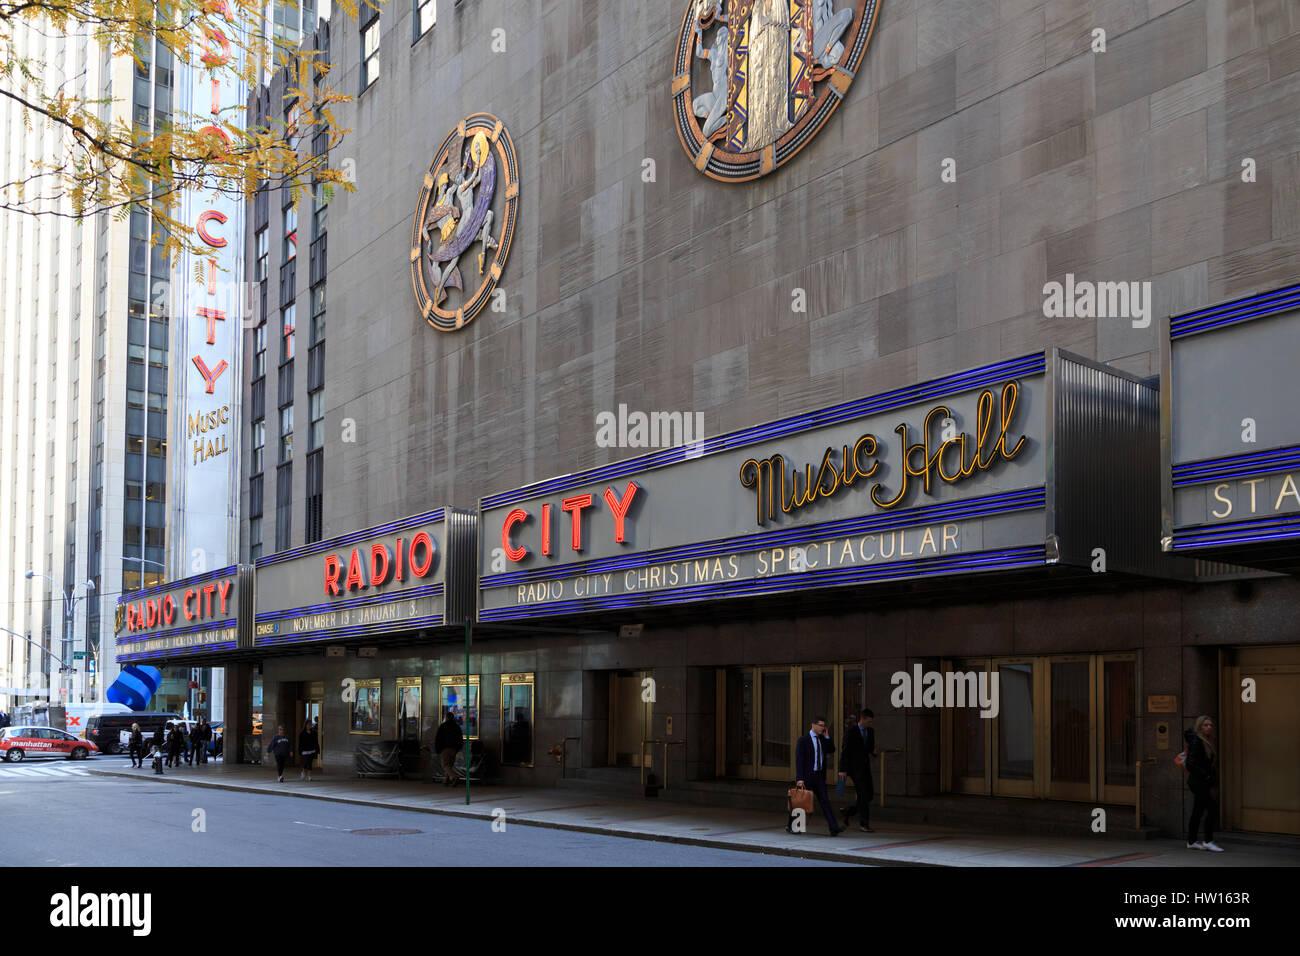 USA, New York, New York City, Manhattan, Rockefeller Center, Radio City Music Hall - Stock Image